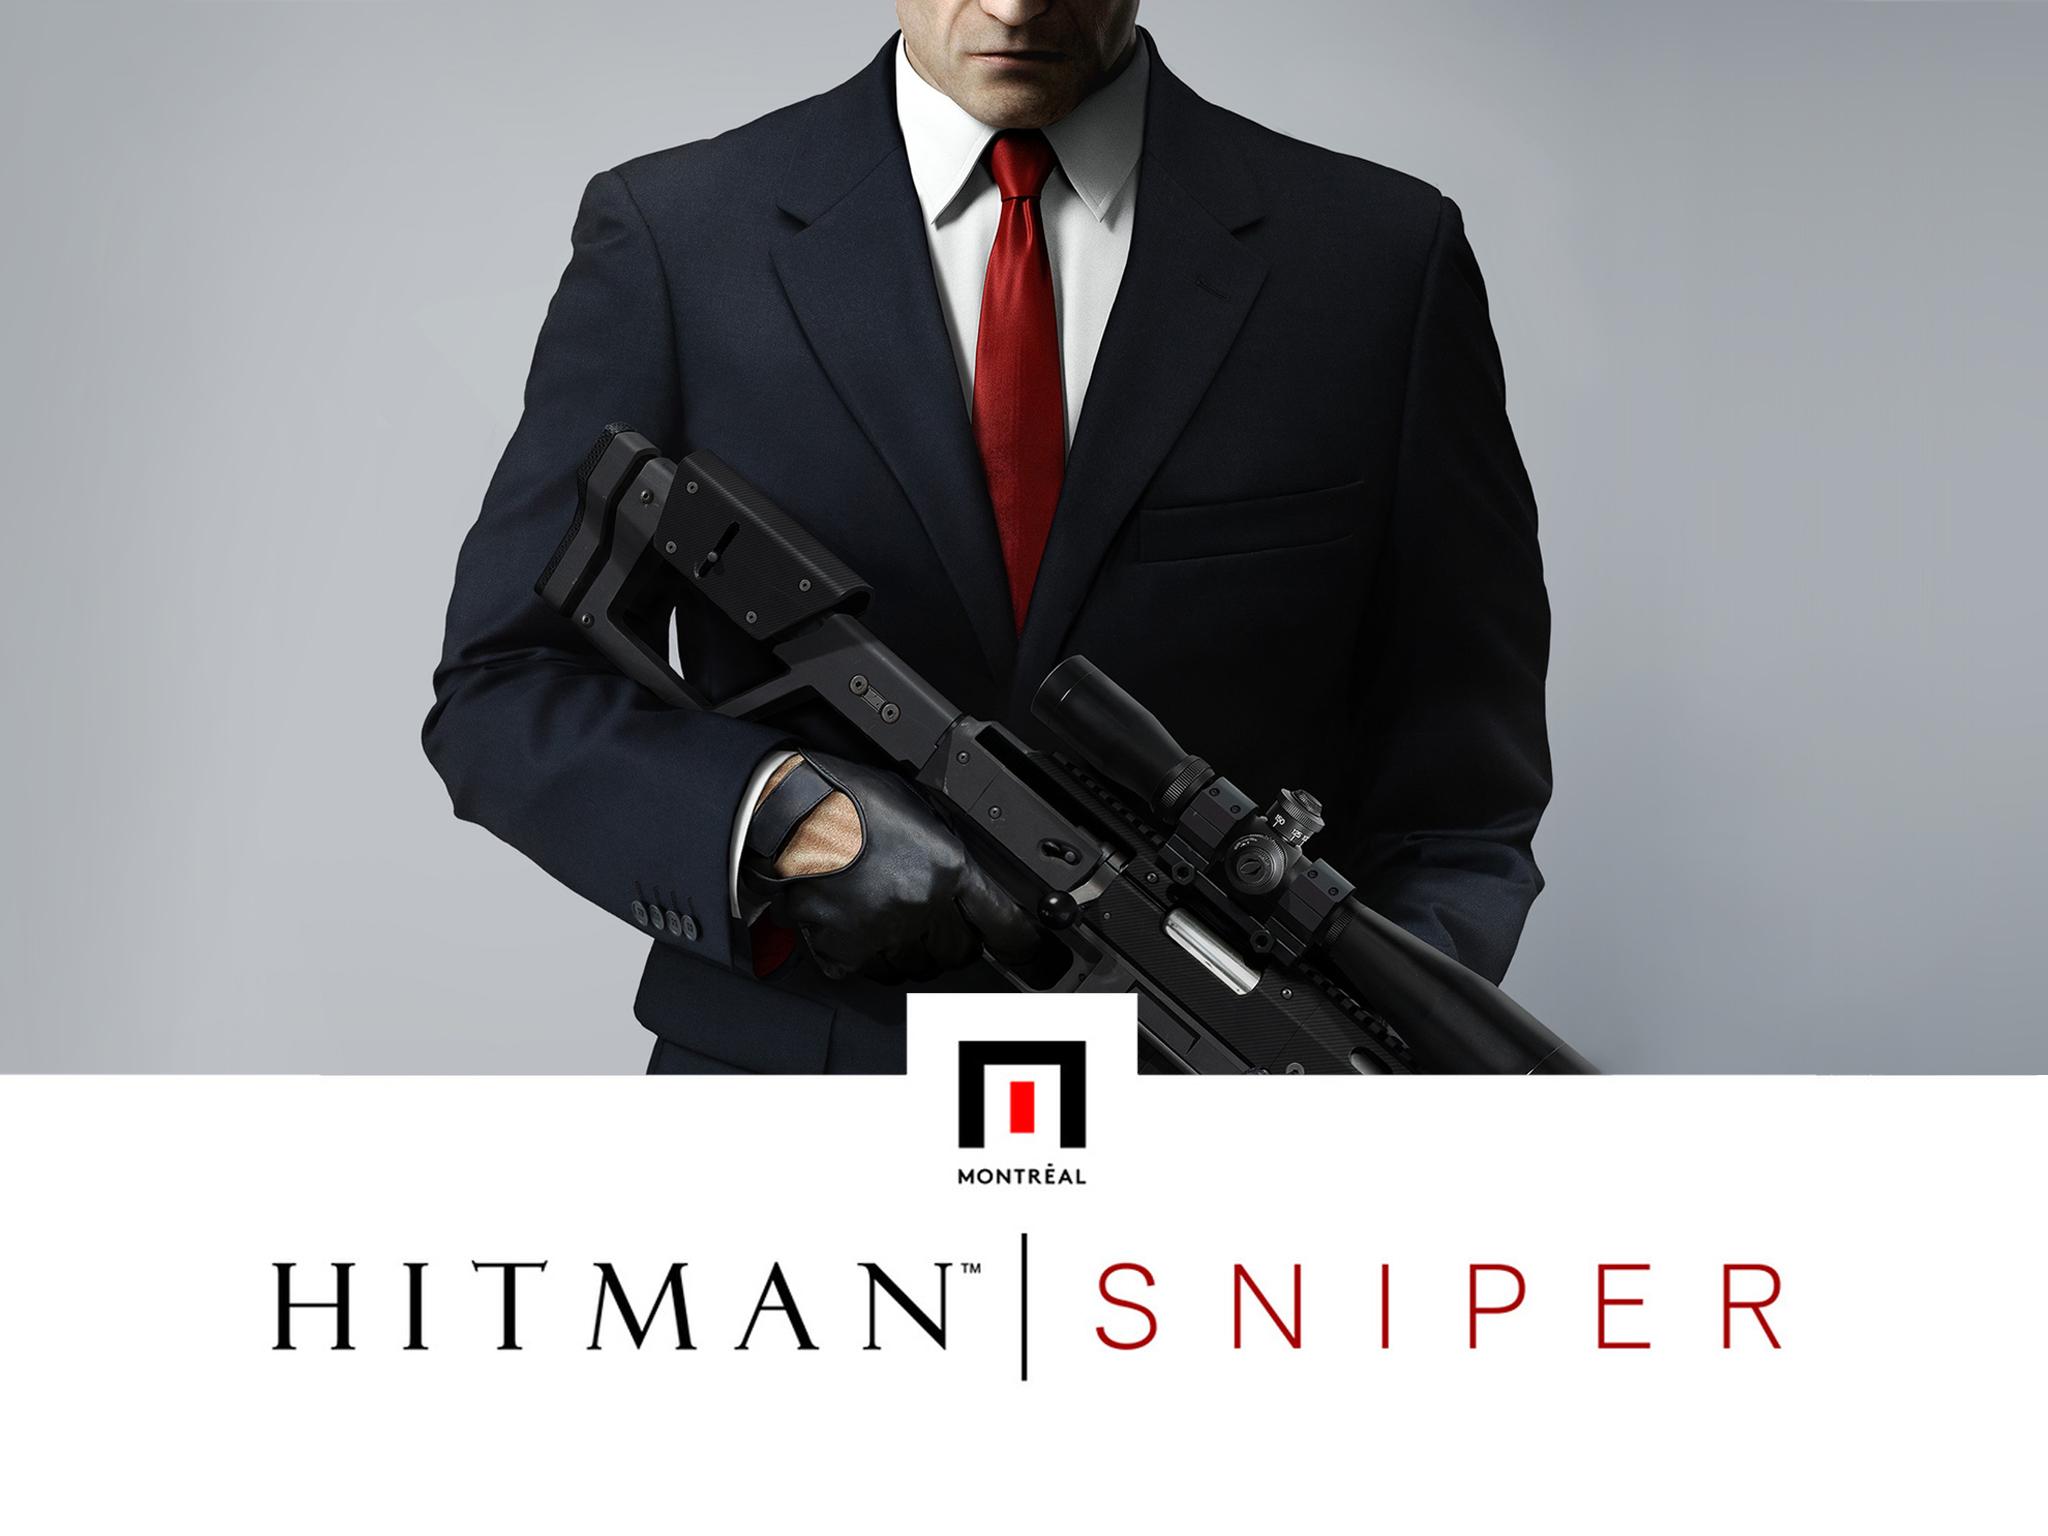 Hitman_Sniper_Title_1433324589